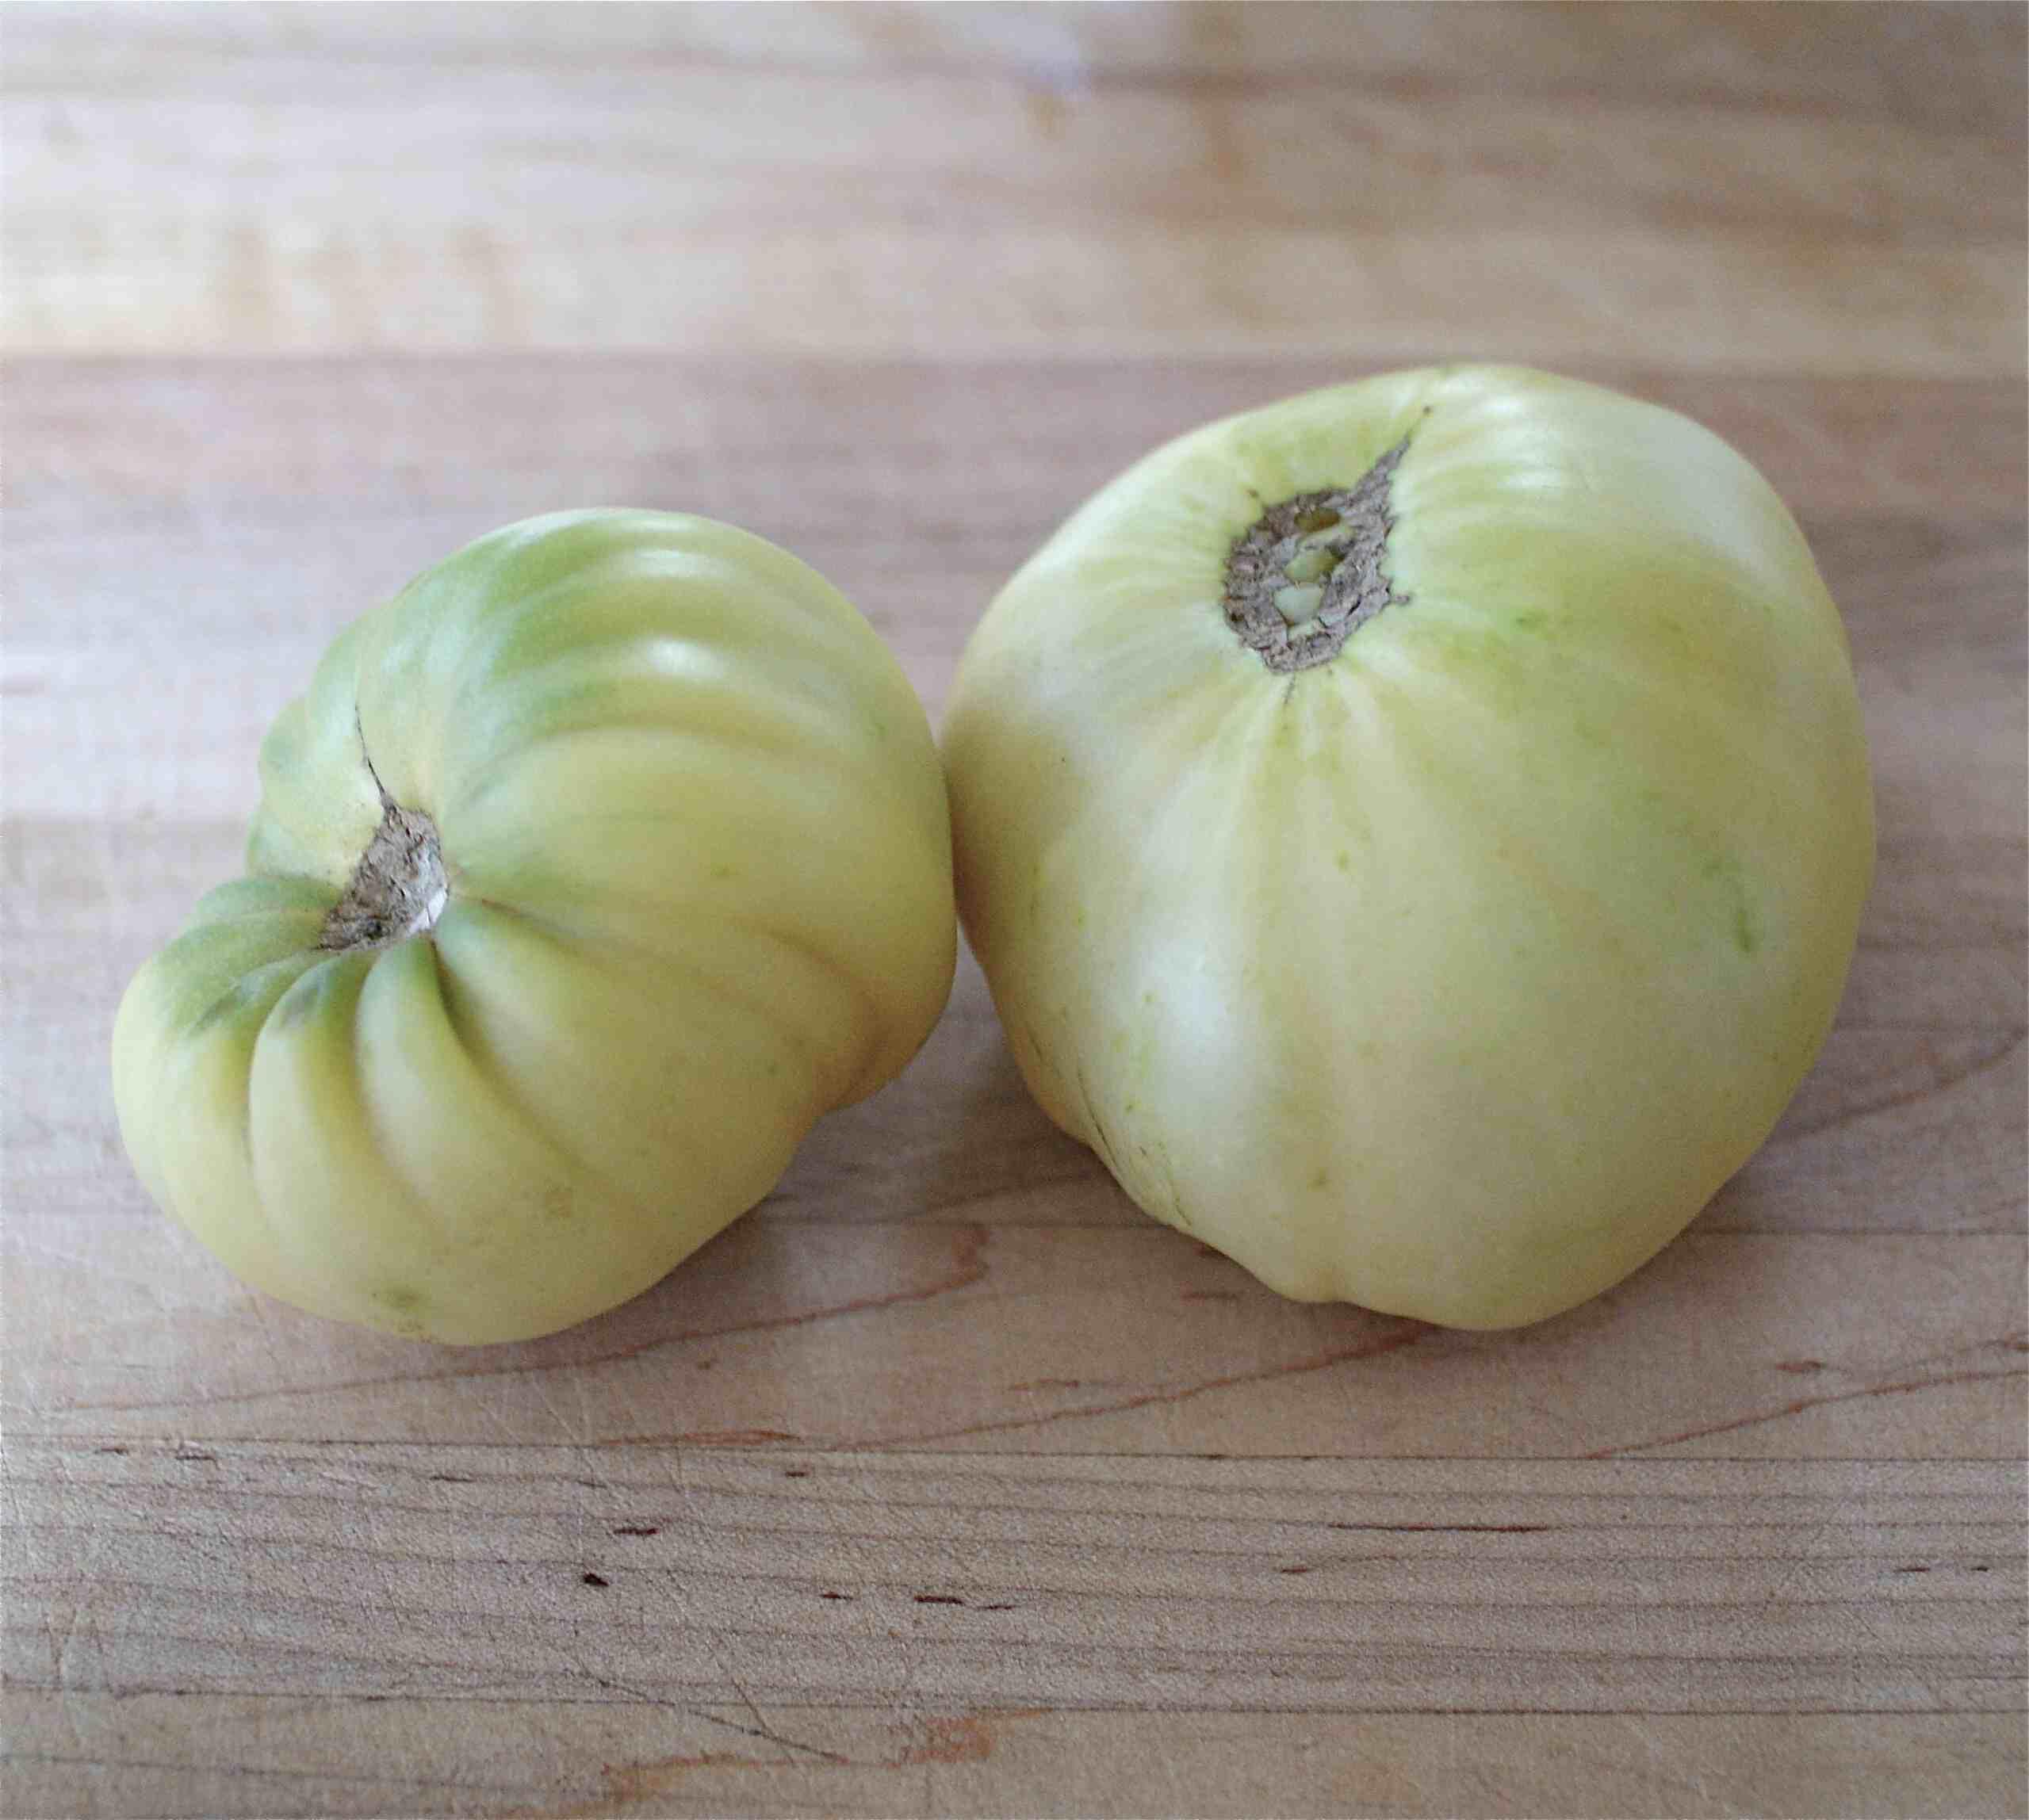 White beauties (white tomatoes)